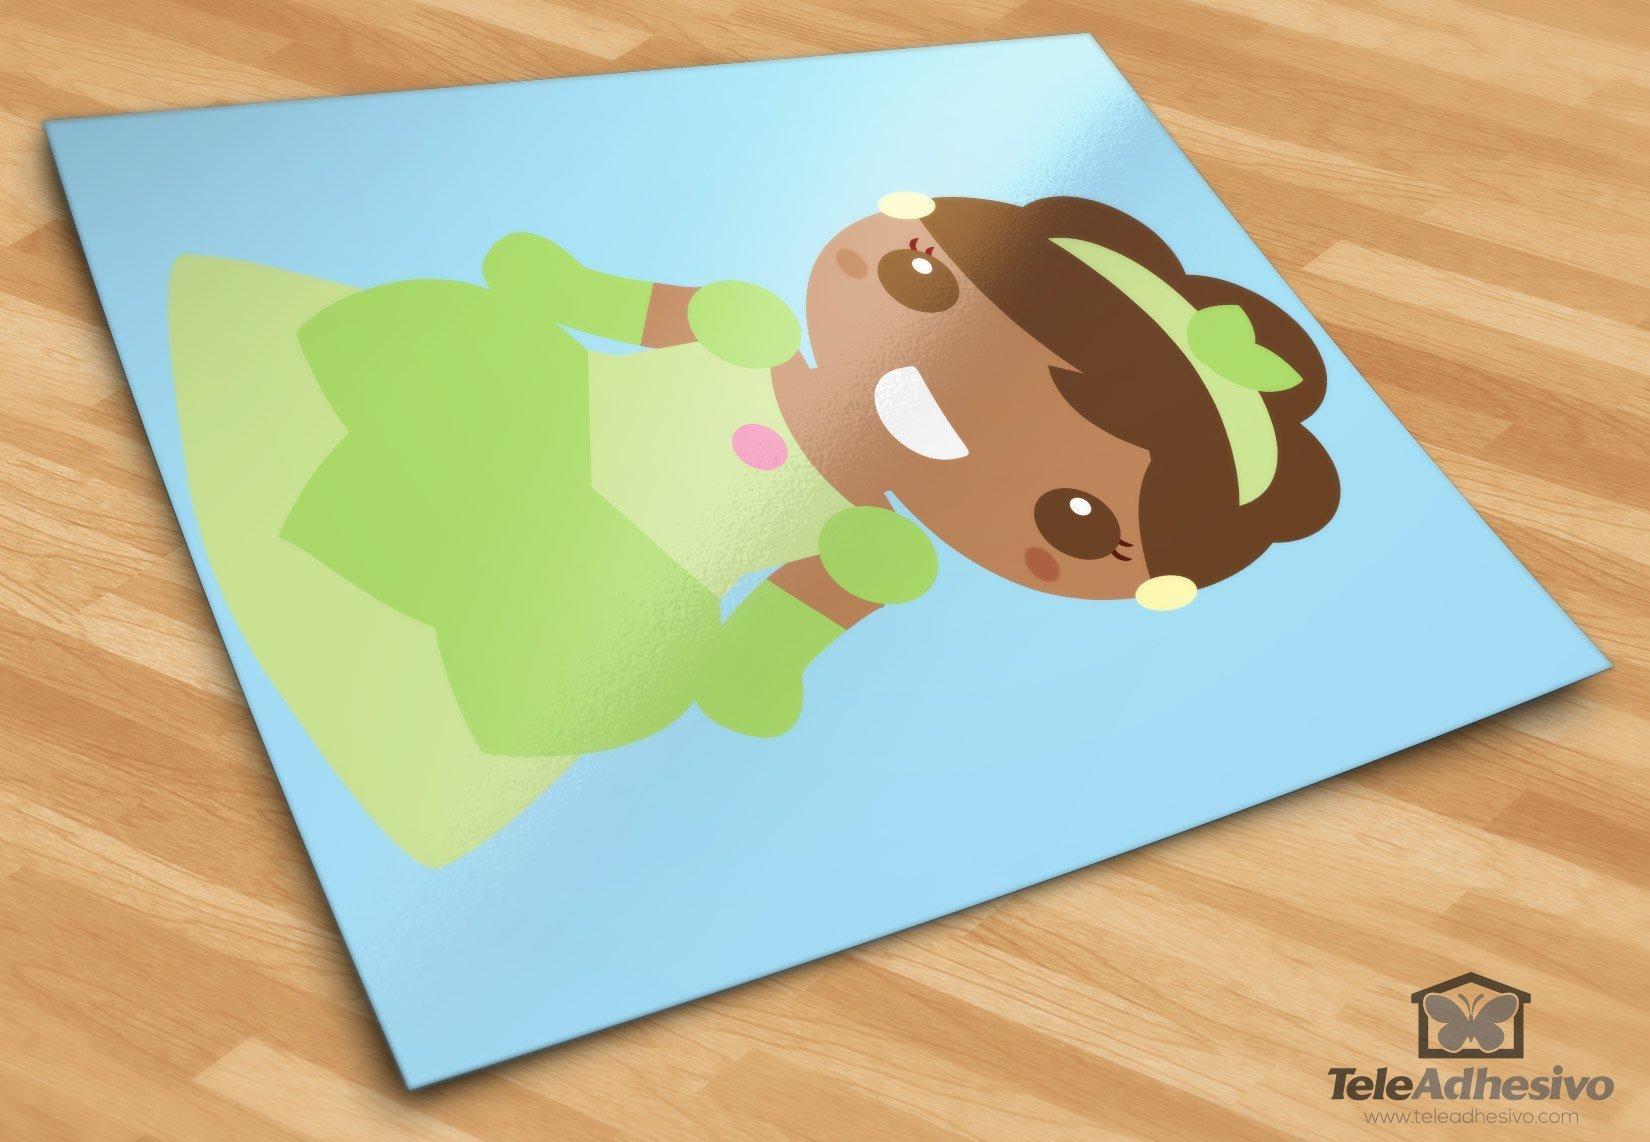 Kinderzimmer Wandtattoo: Tiana